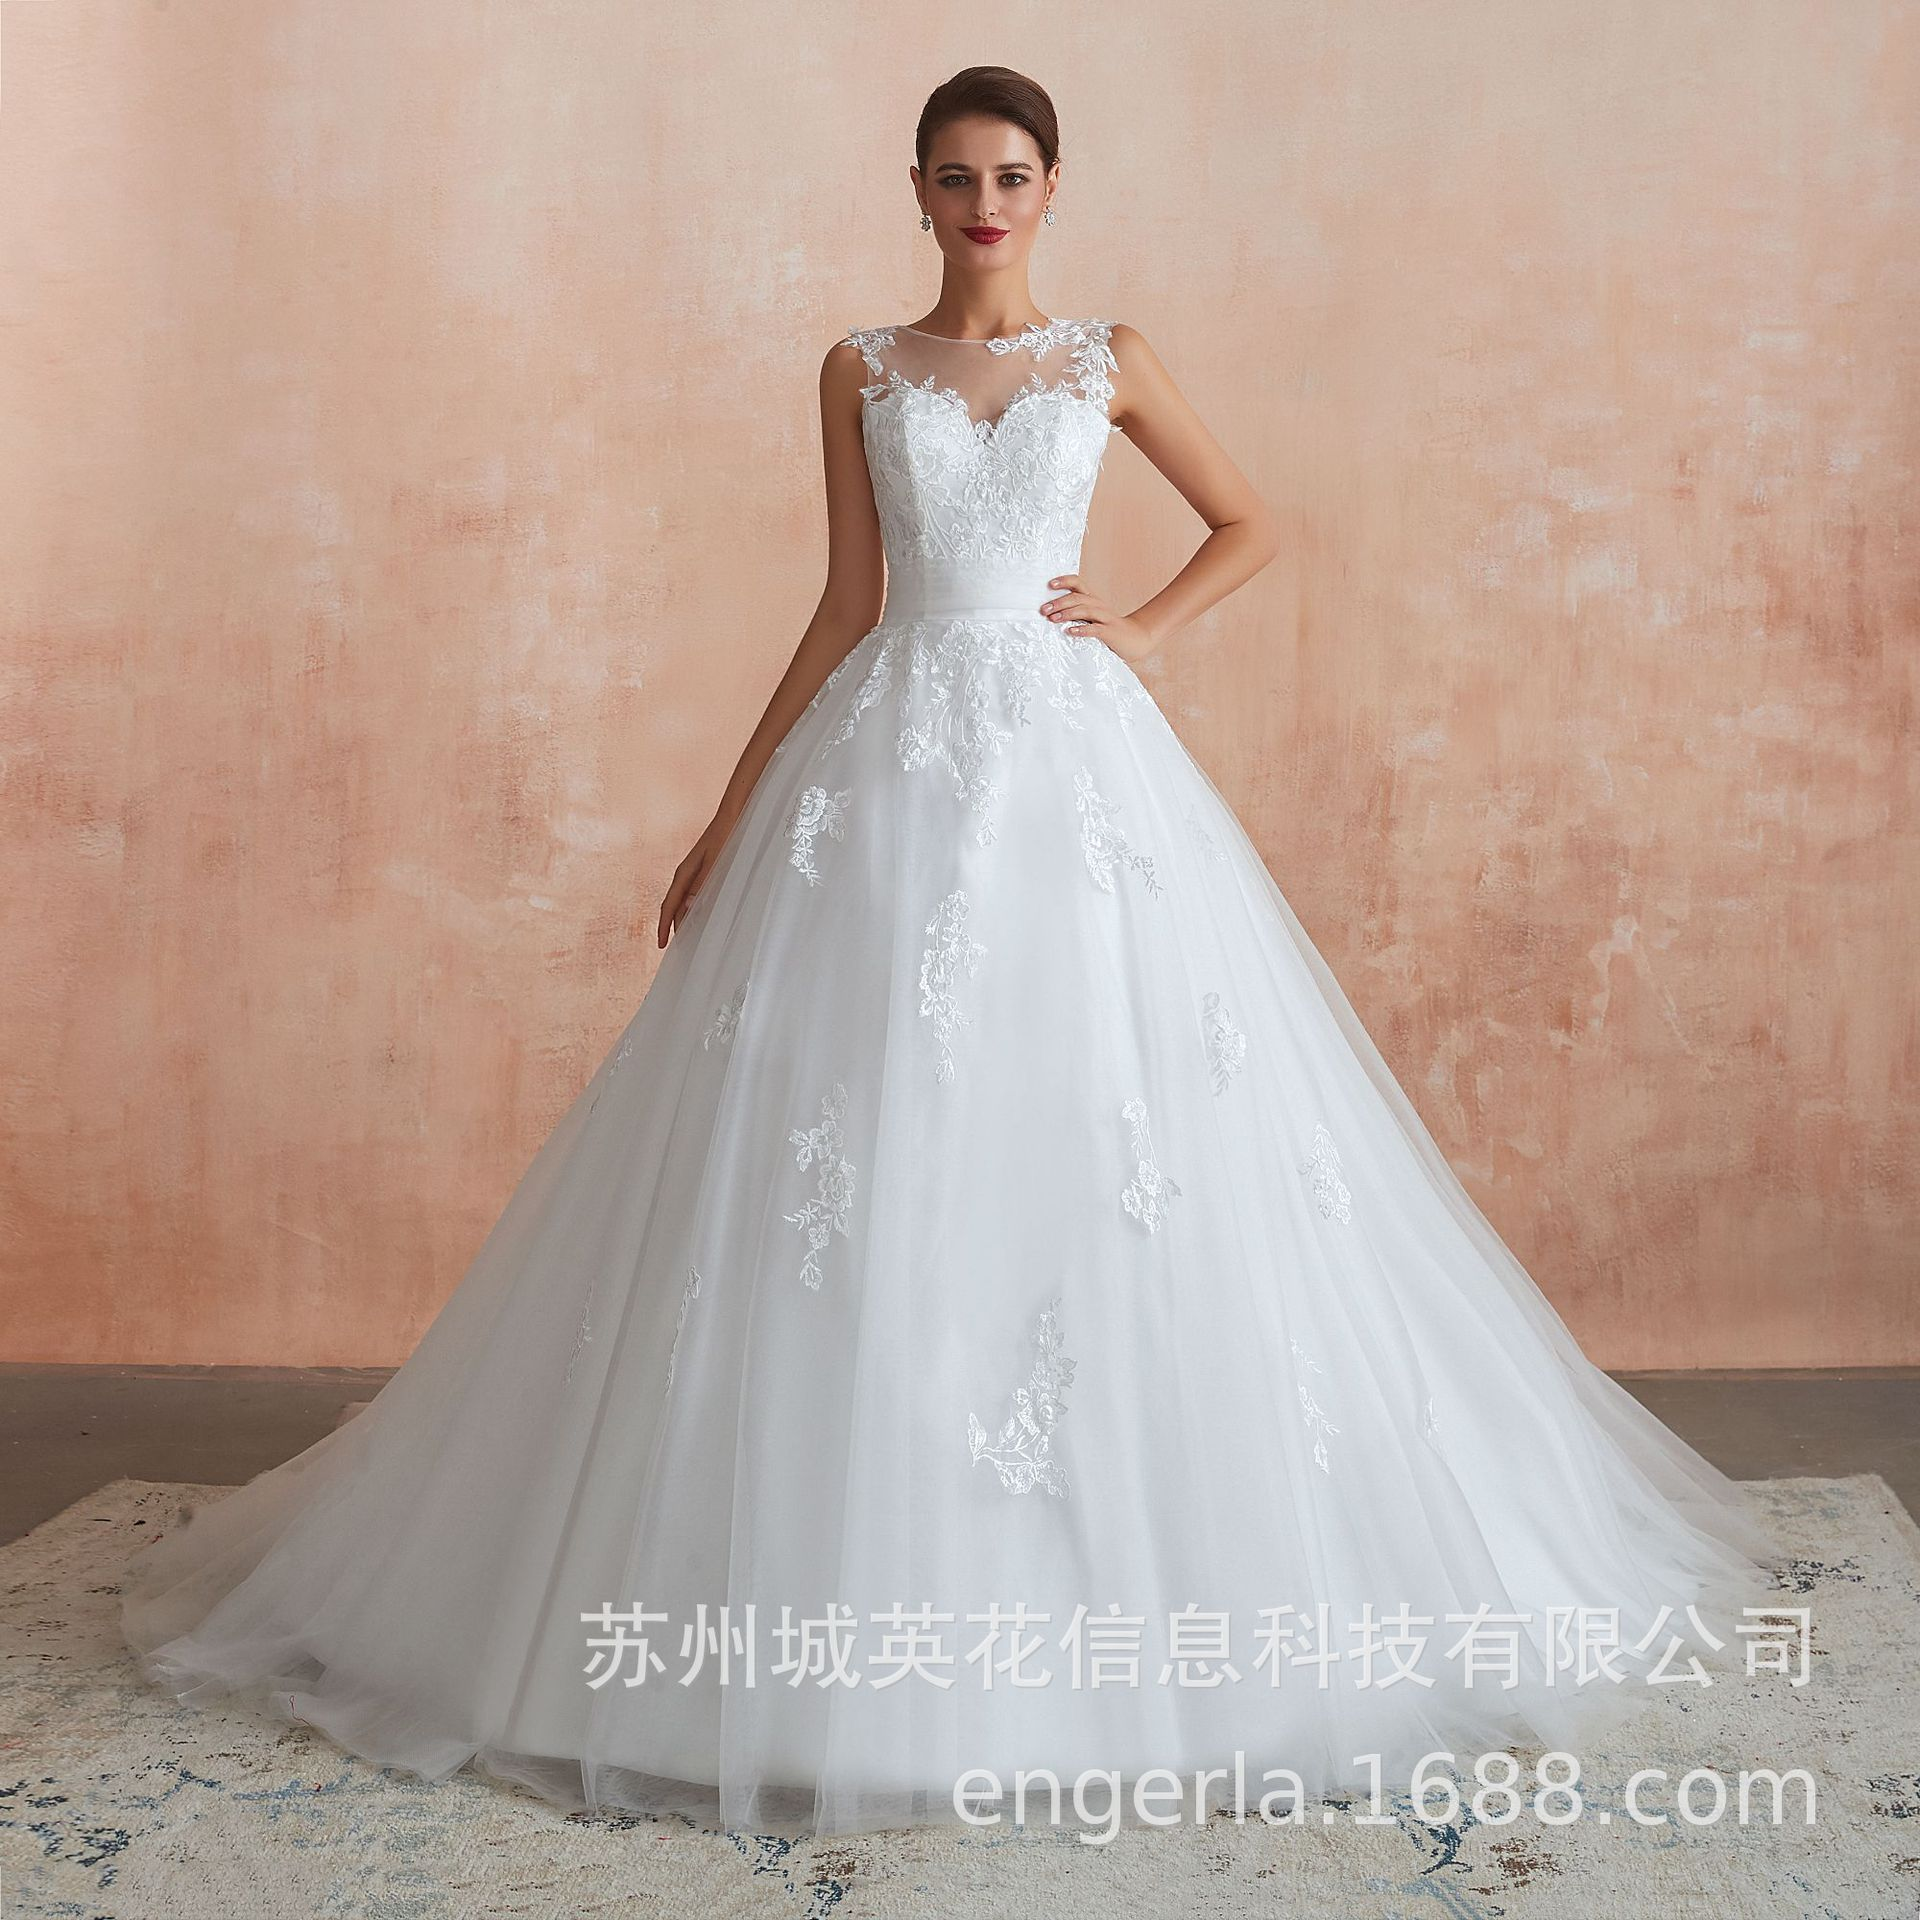 French Luxury Ball Gown Wedding Dresses Lace Appliques Pearls Bridal Gowns Vestido De Novias